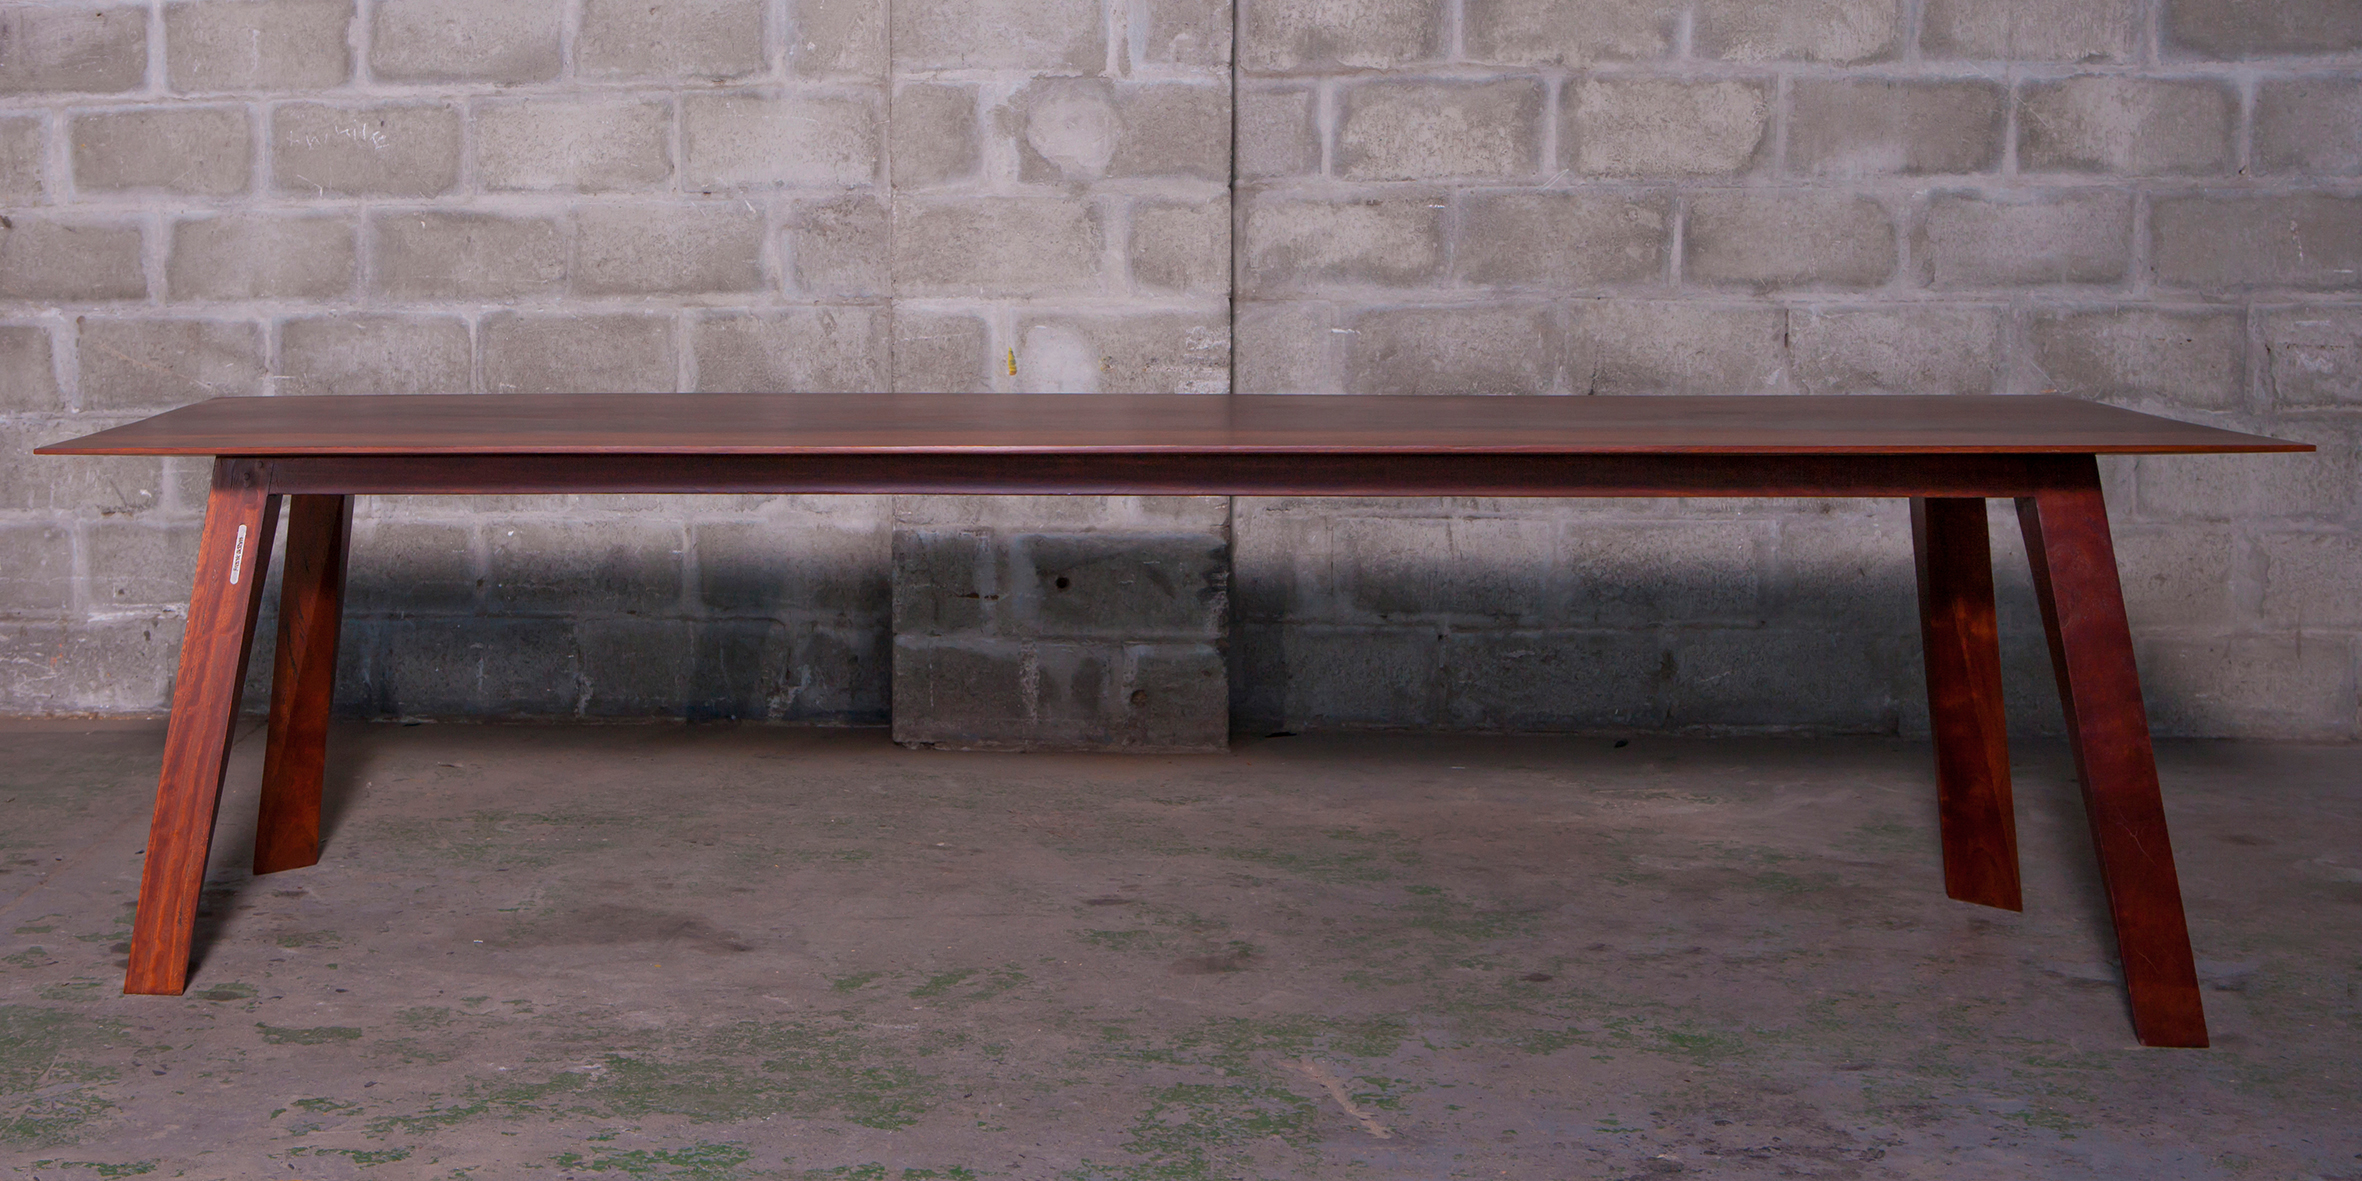 fbs - table 1, 2700 l x 1100 w x 730 h, reclaimed jarrah REV 1